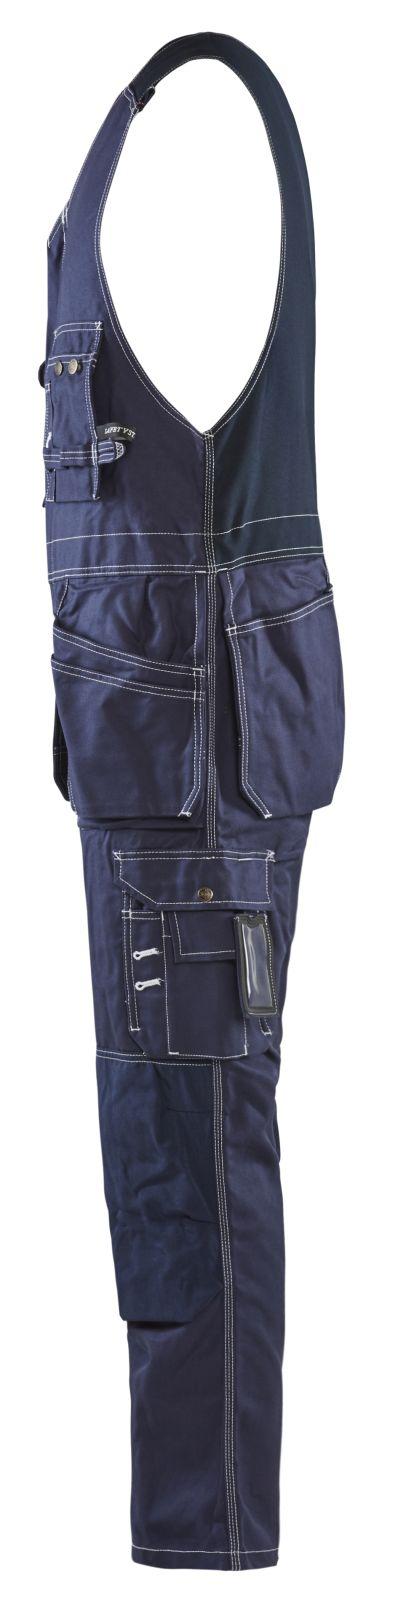 Blaklader Bodybroeken 26501370 marineblauw(8800)